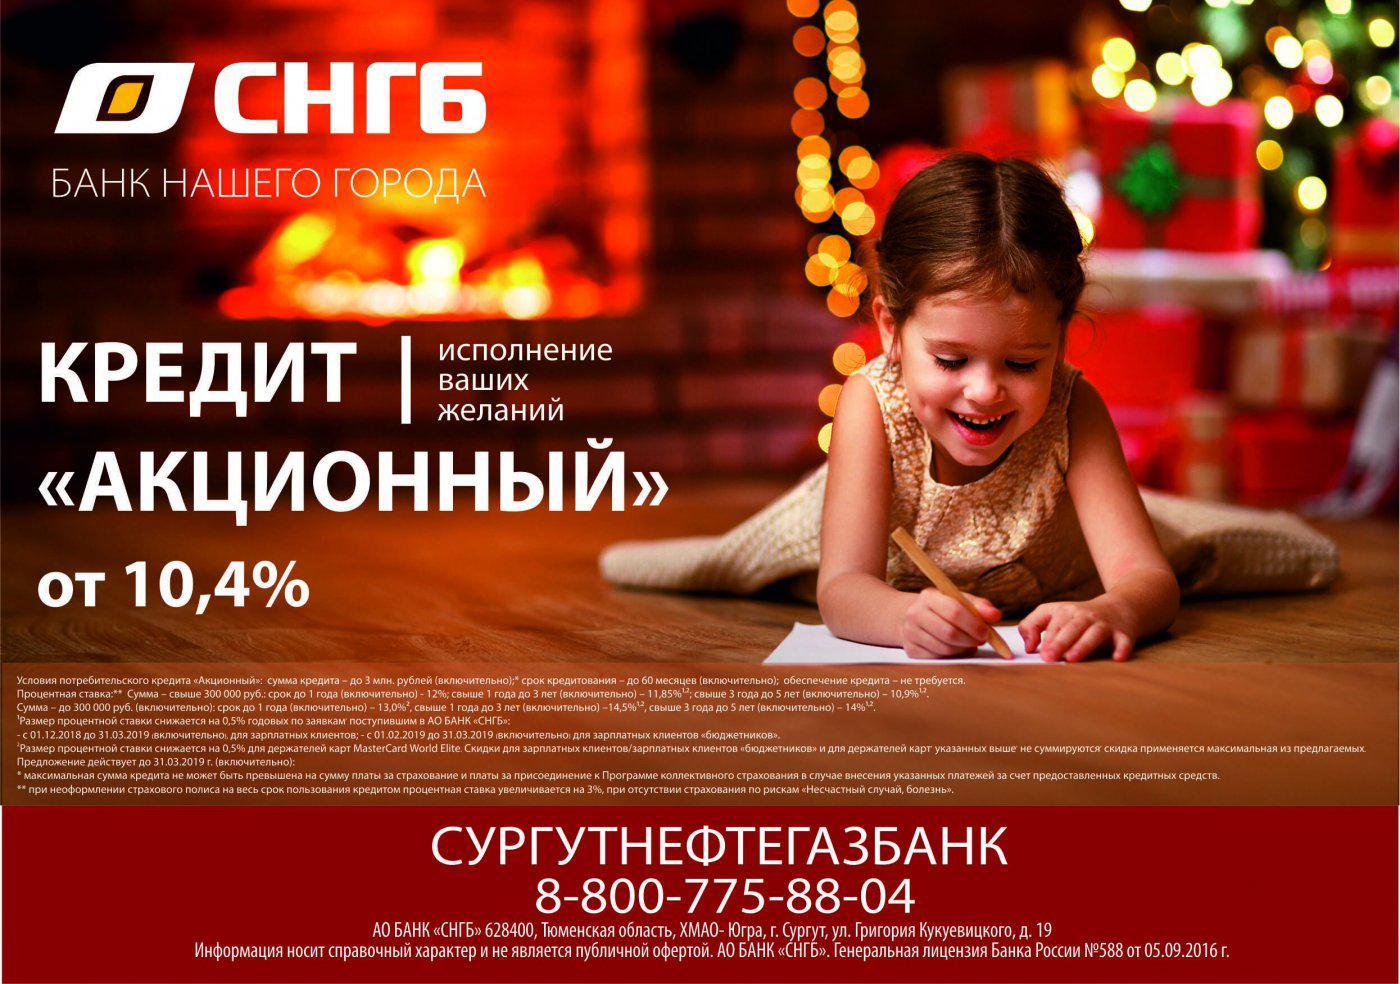 кредитный калькулятор сбербанк казахстан 2020